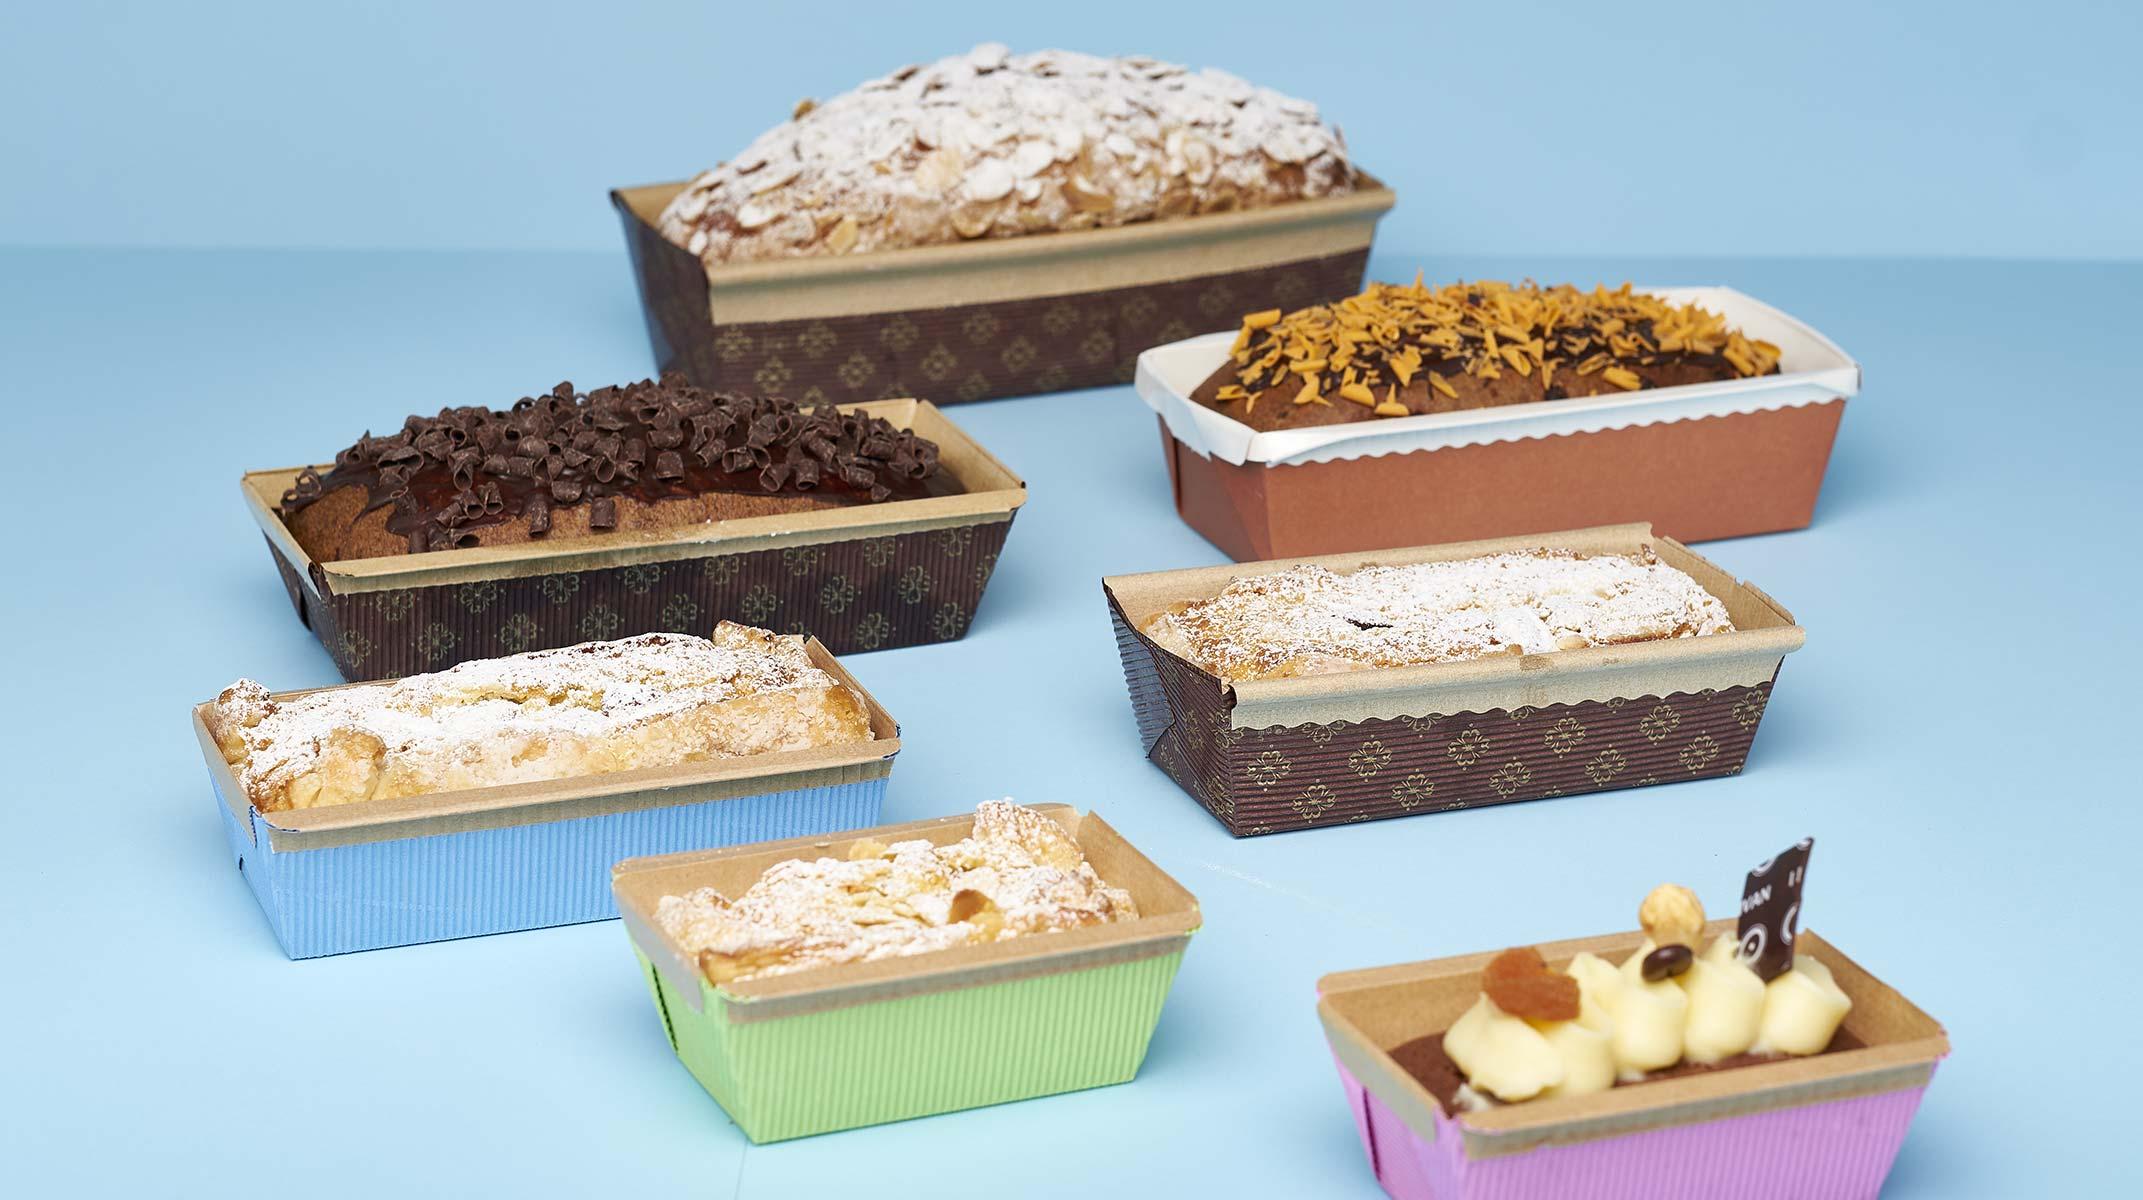 Novacart Russia plum cake molds